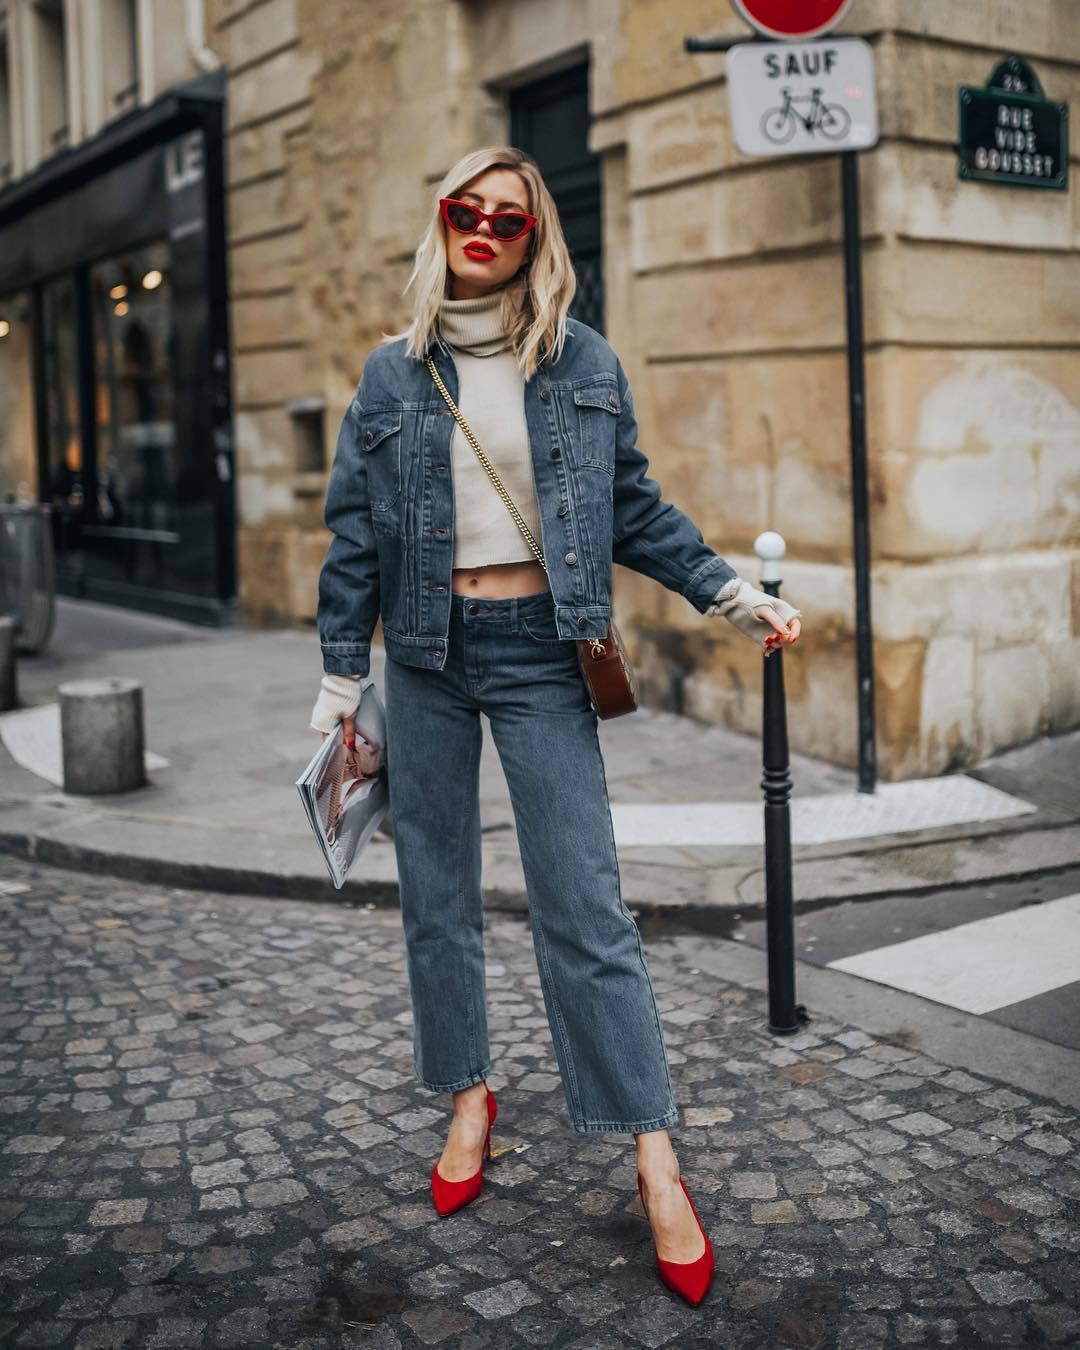 jeans boyfriend jeans denim jacket pumps brown bag crossbody bag turtleneck sweater cropped turtleneck white sweater sunglasses